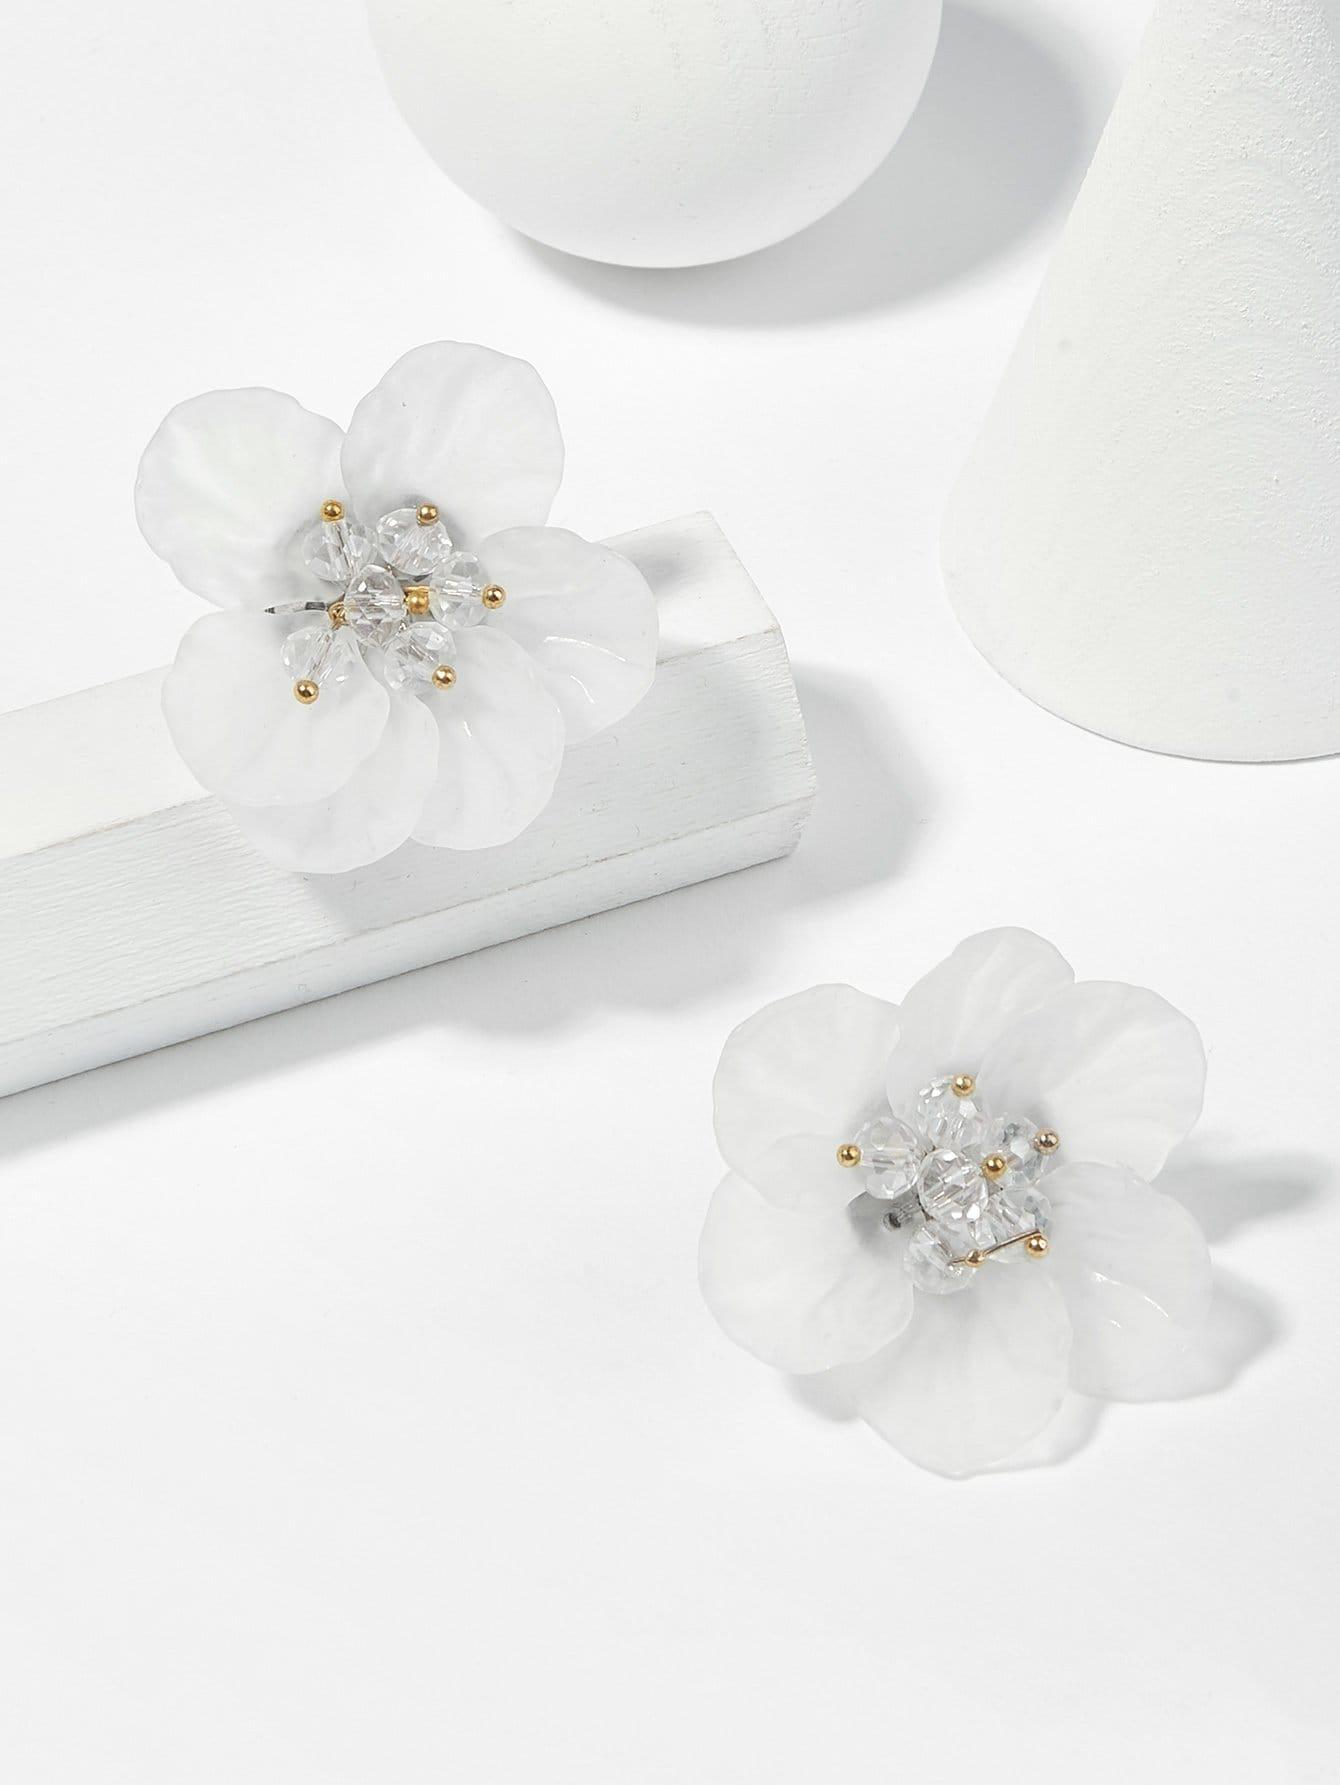 Flower Shaped Stud Earrings waterdrop shaped stud earrings